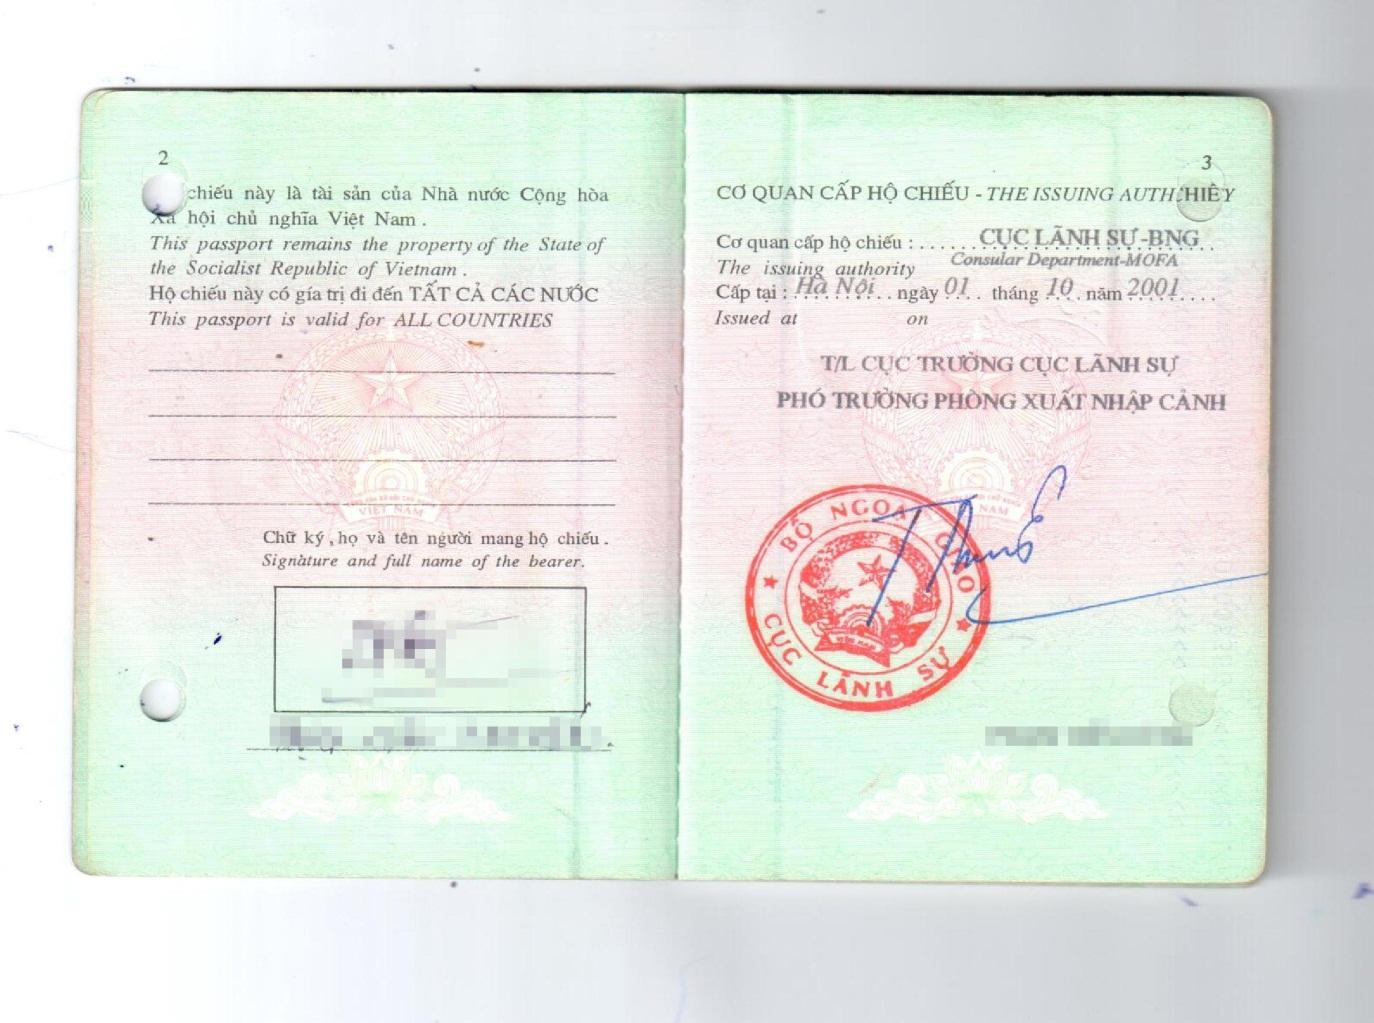 huong-dan-cac-thu-tuc-lam-ho-chieu-pho-thong-visabaongoc.com-001